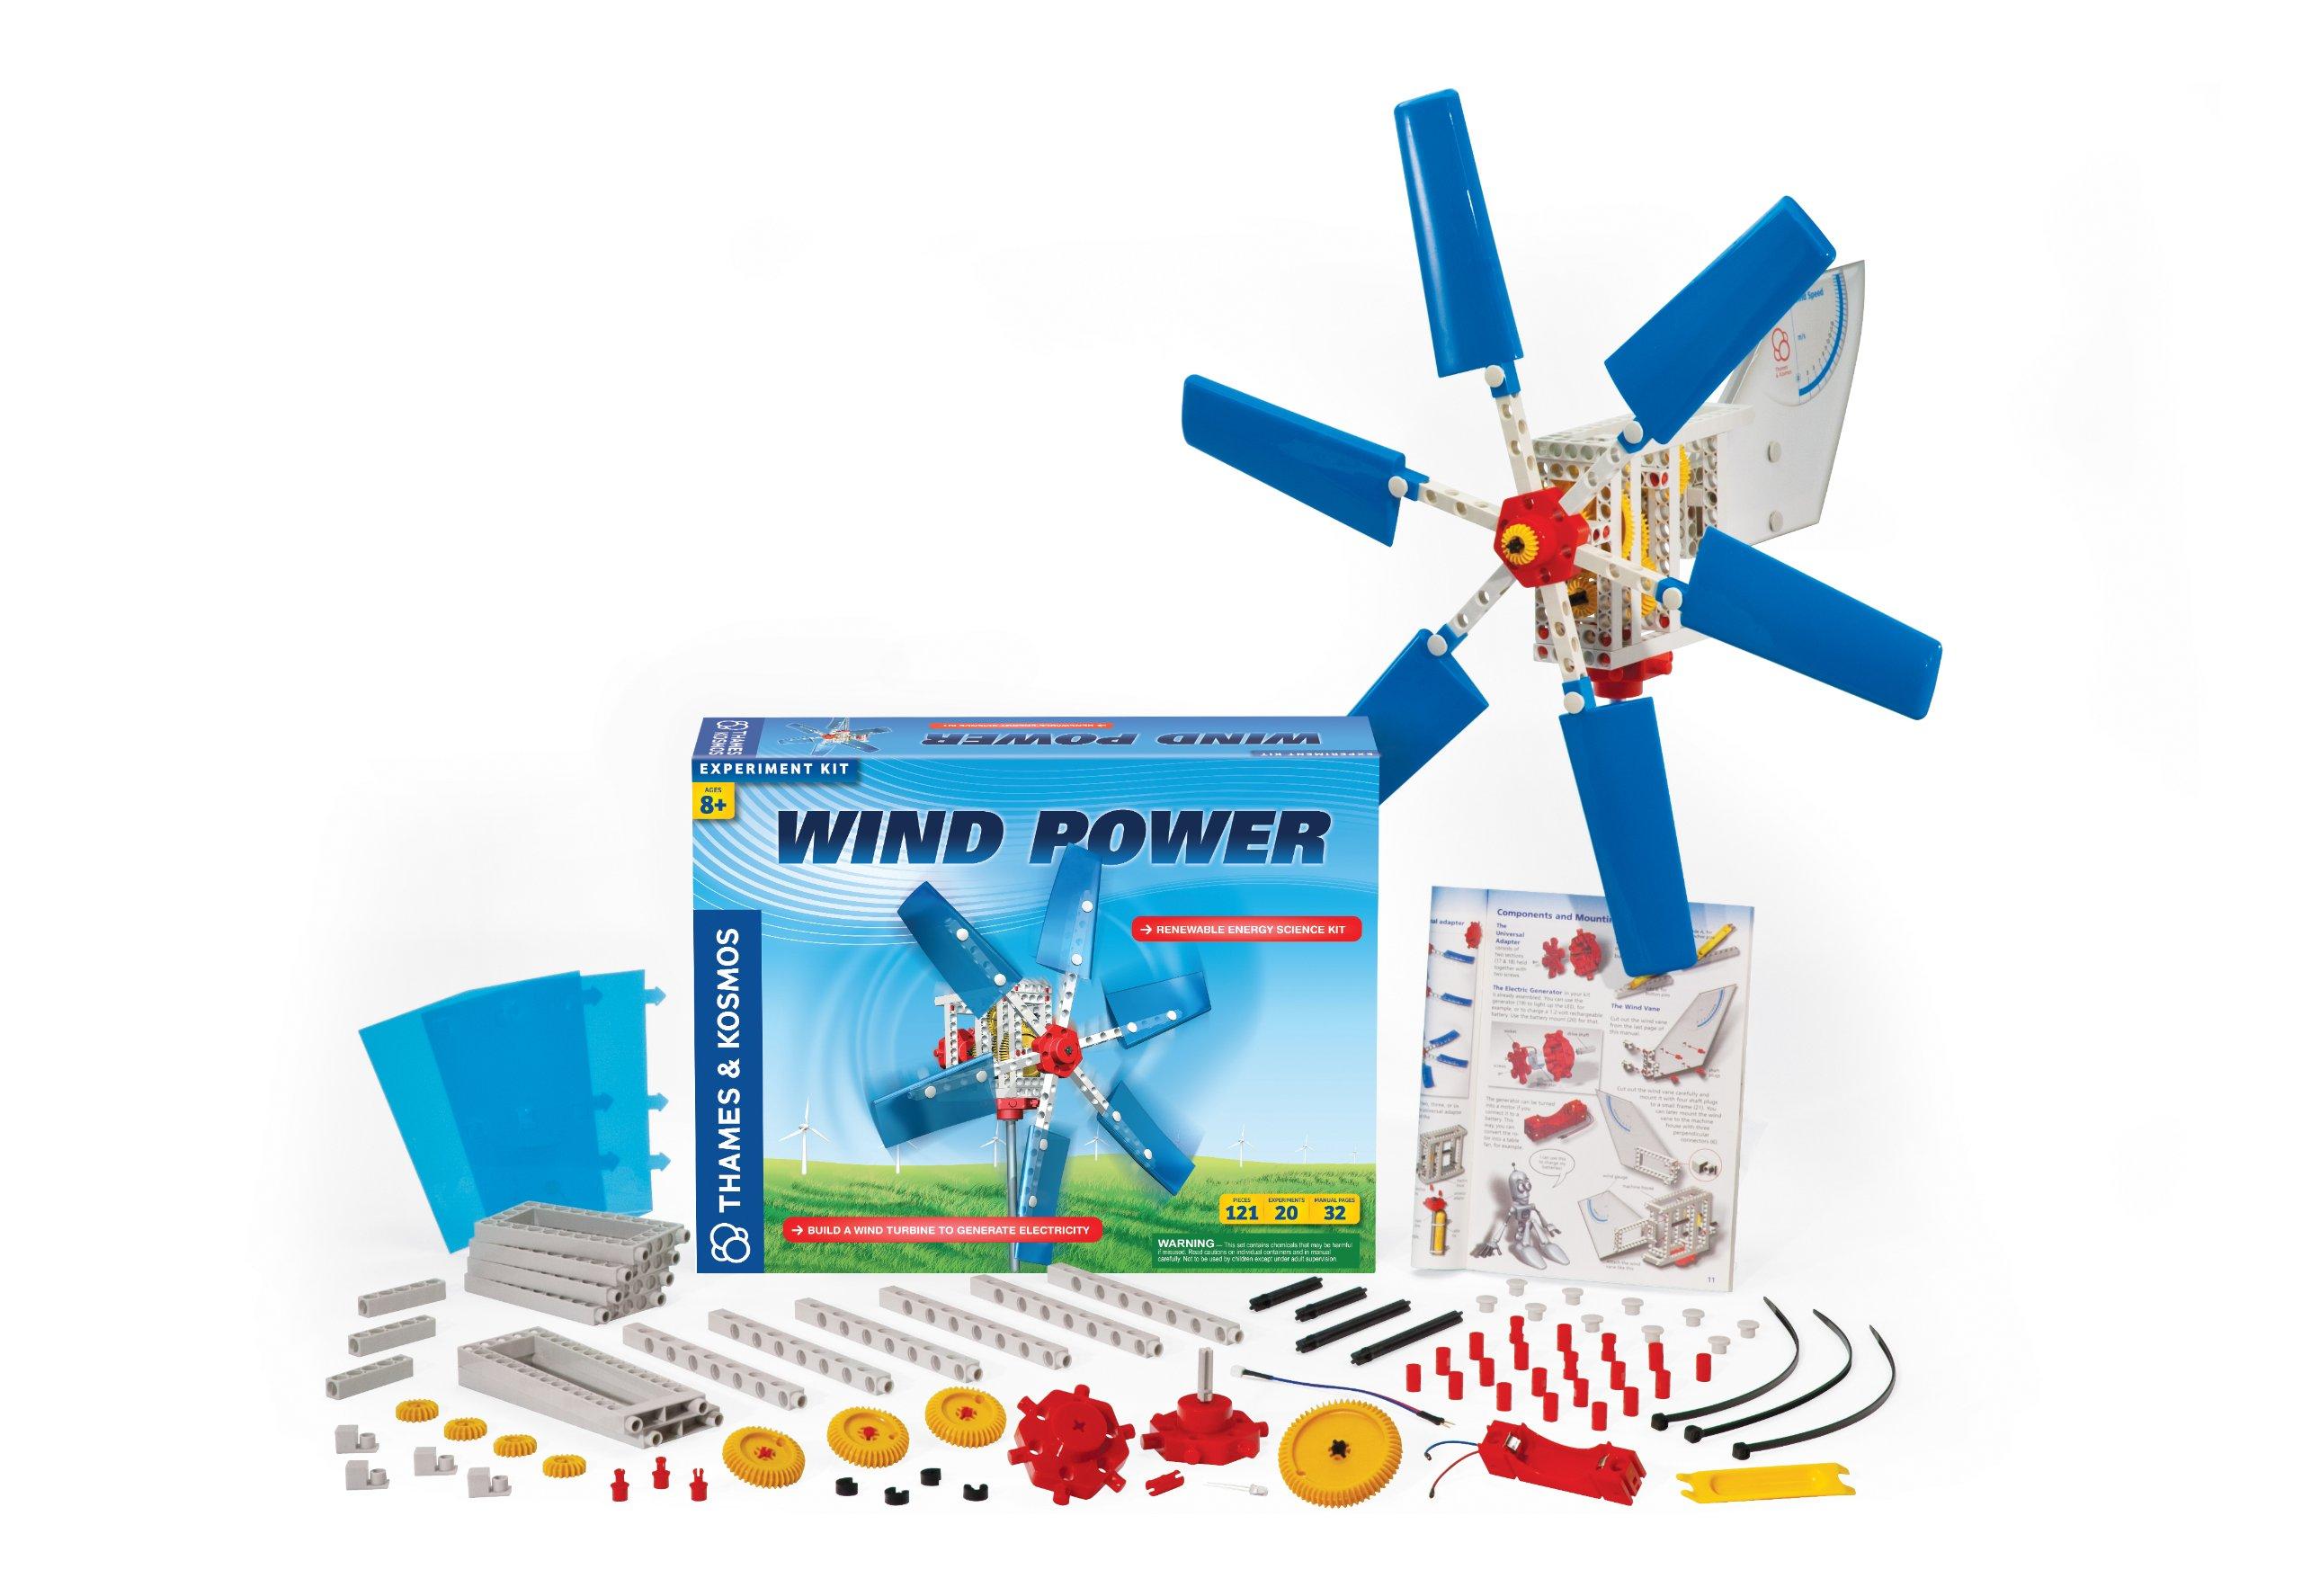 Thames & Kosmos Alternative Energy and Environmental Science Wind Power